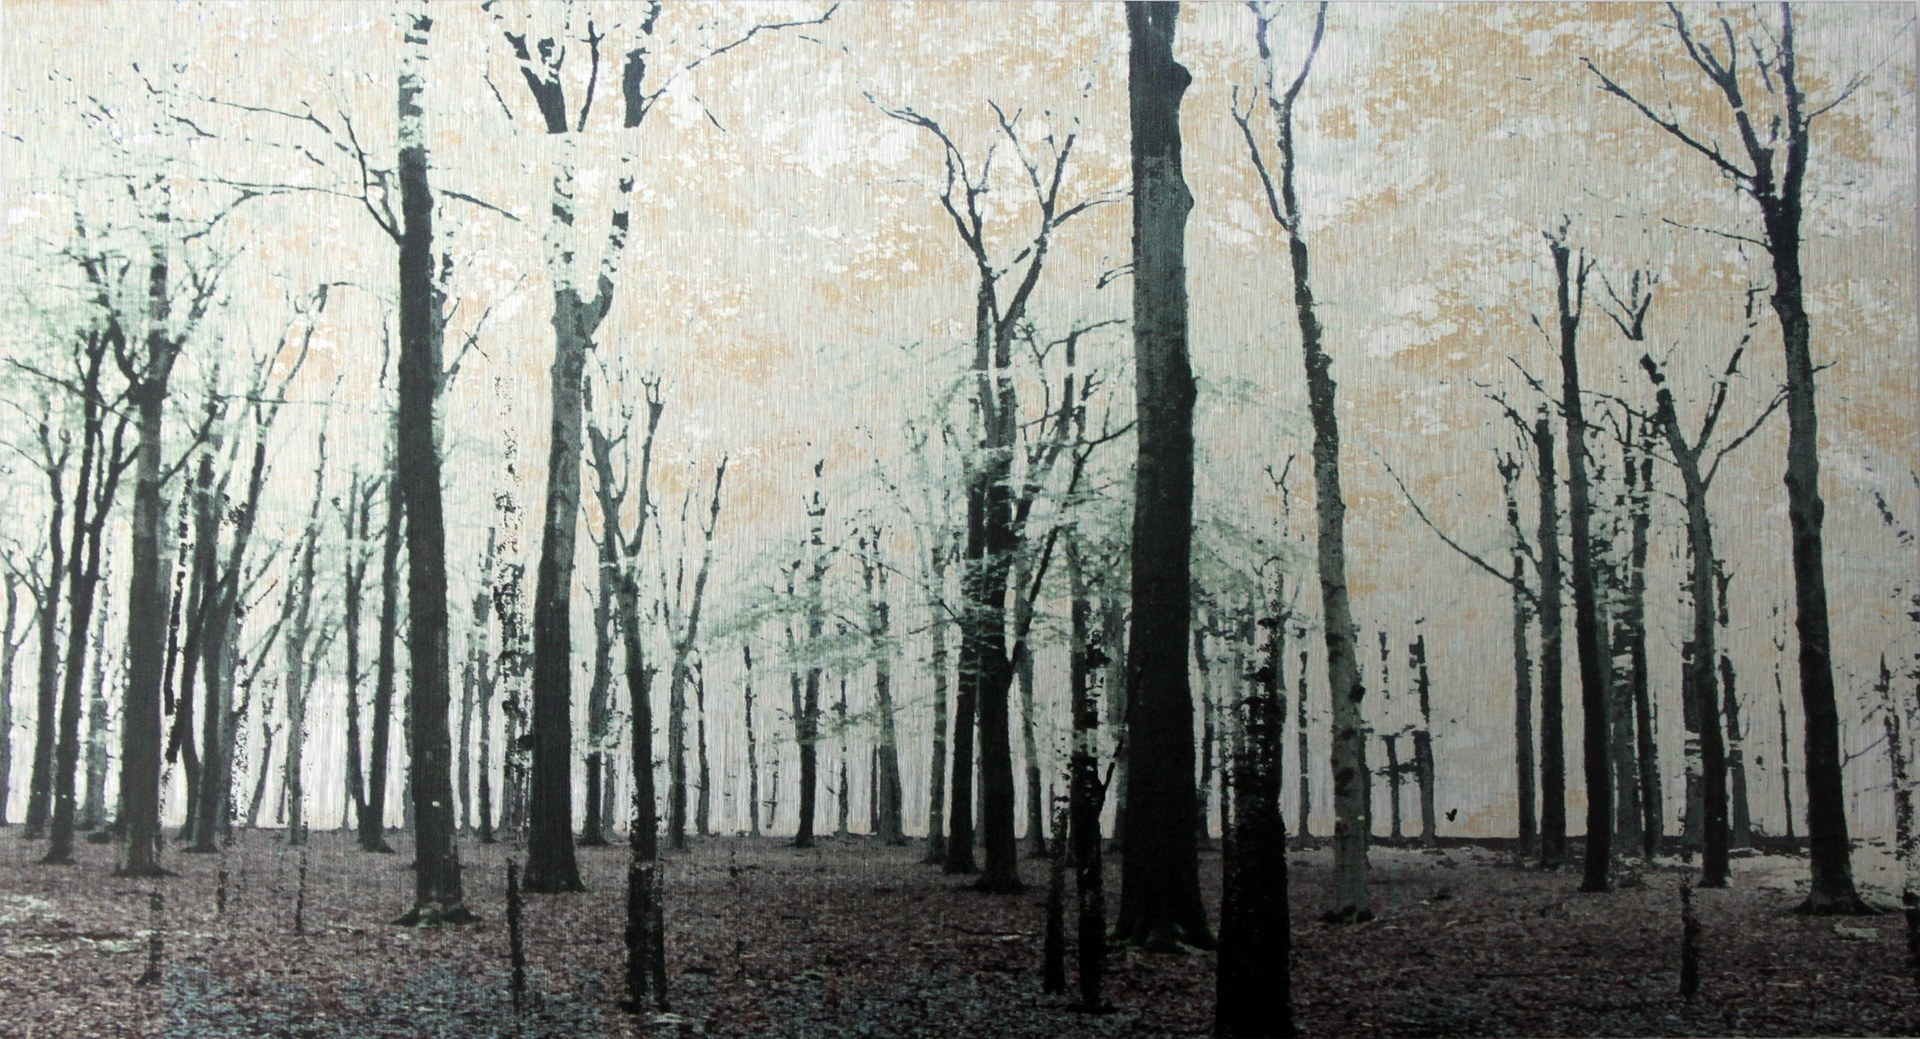 Fred Robeson, Utrechtse Heuvelrug